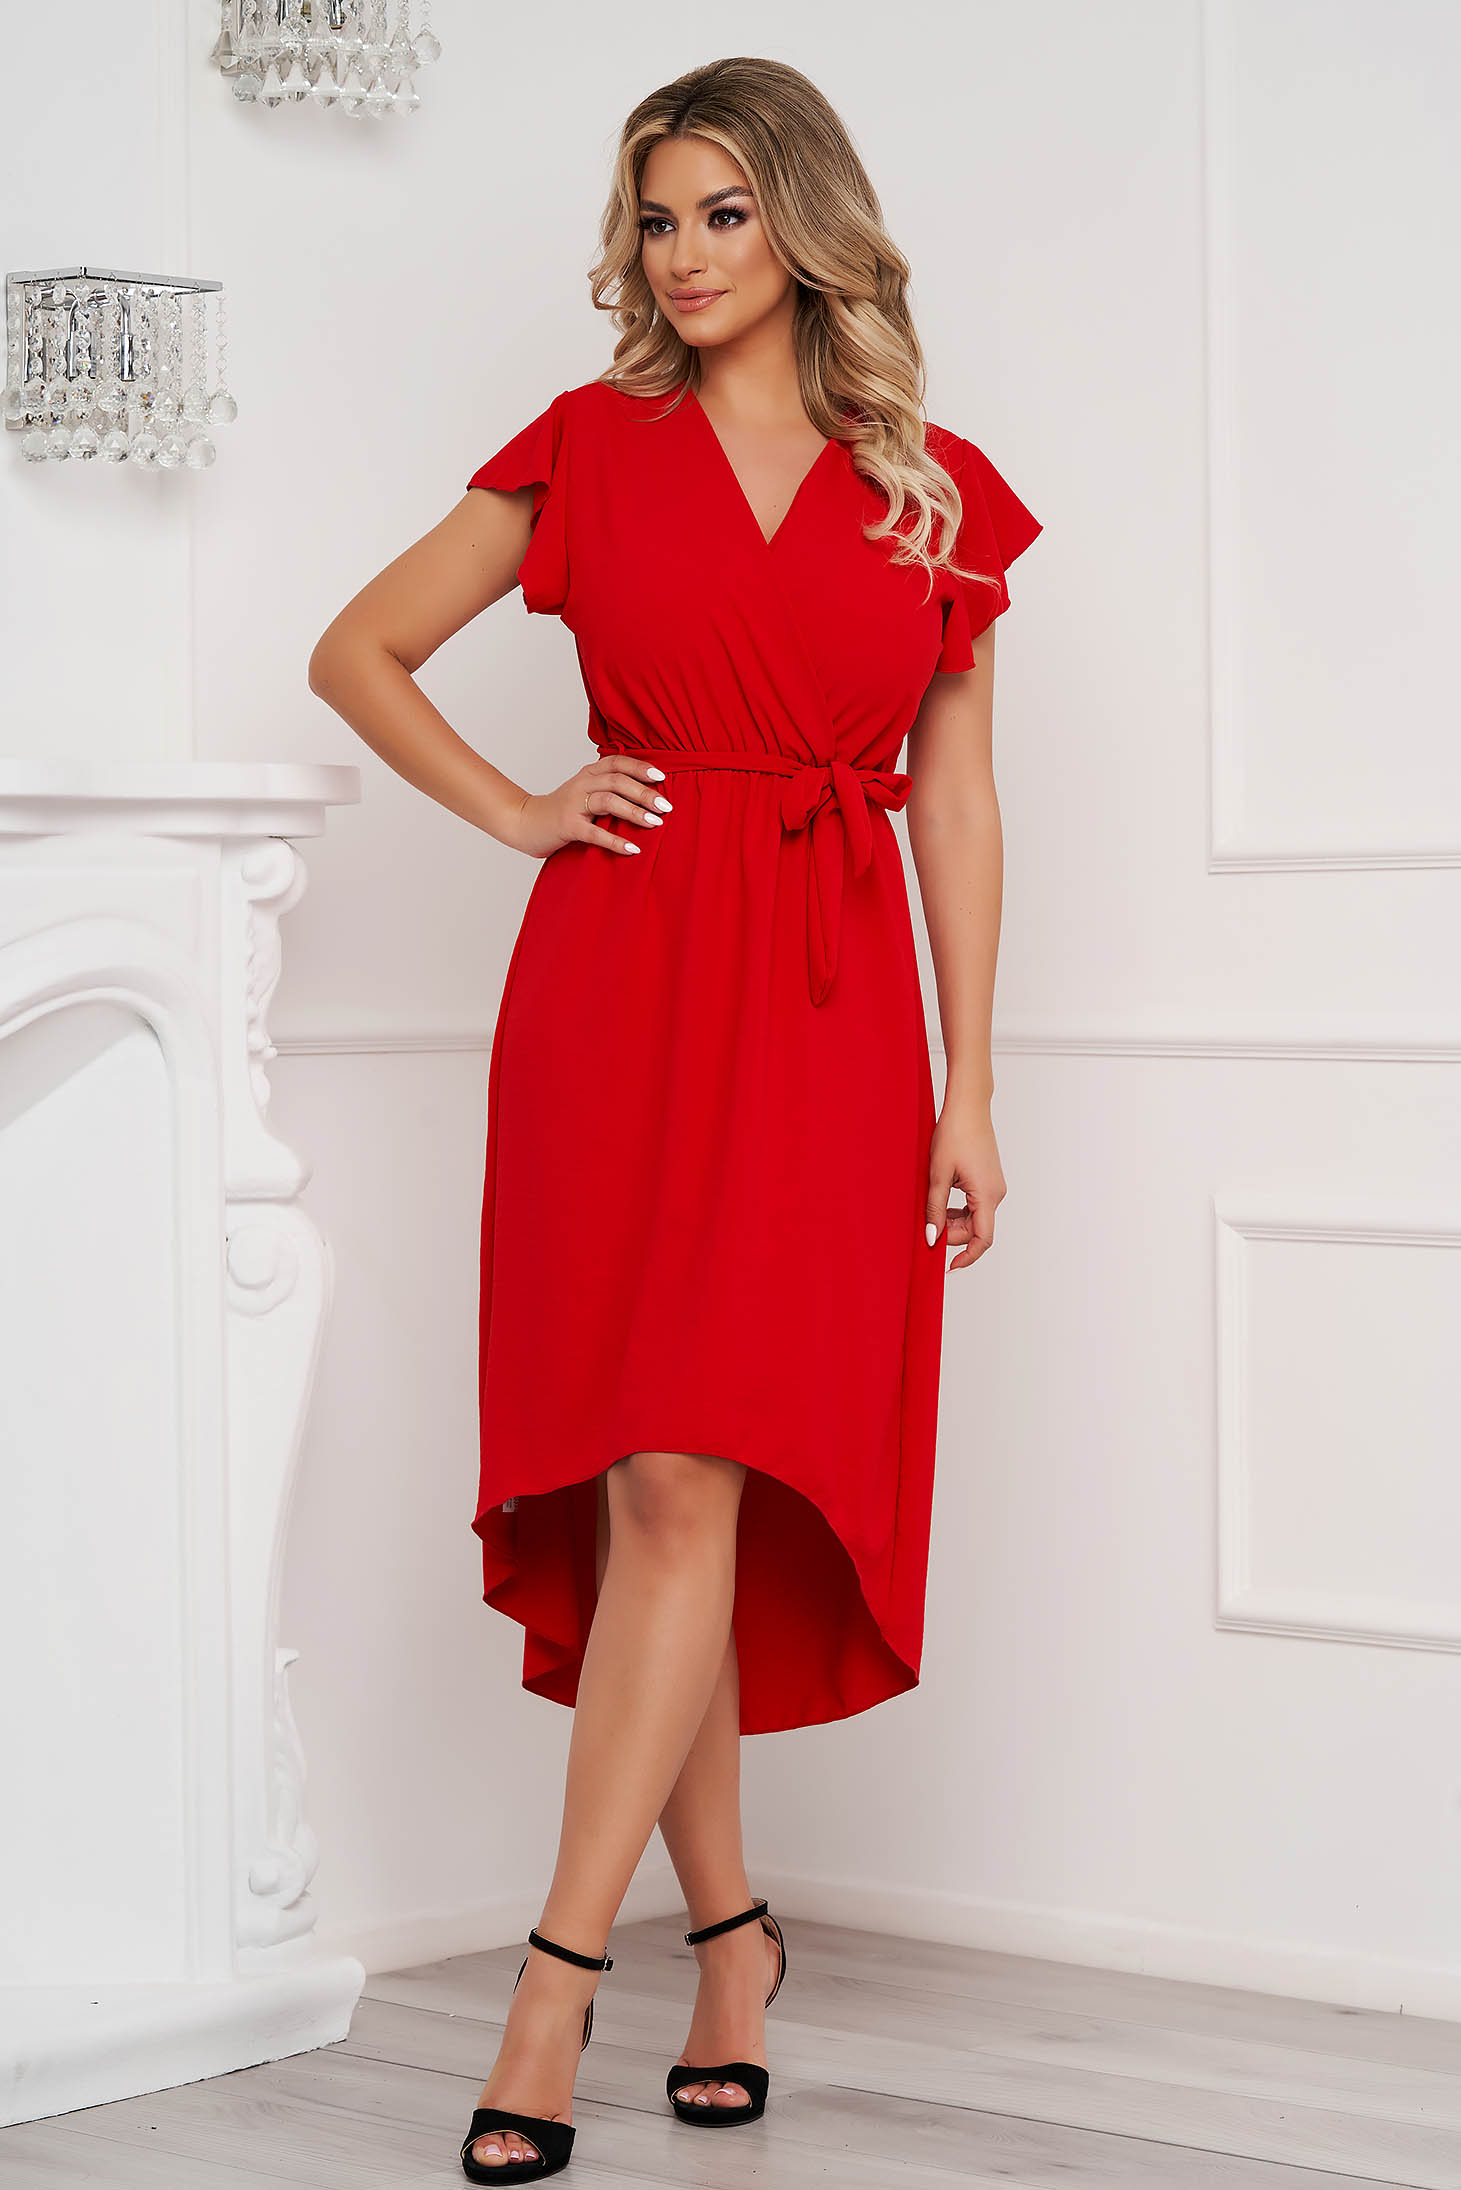 Rochie Lady Pandora rosie midi asimetrica in clos cu elastic in talie din material vaporos